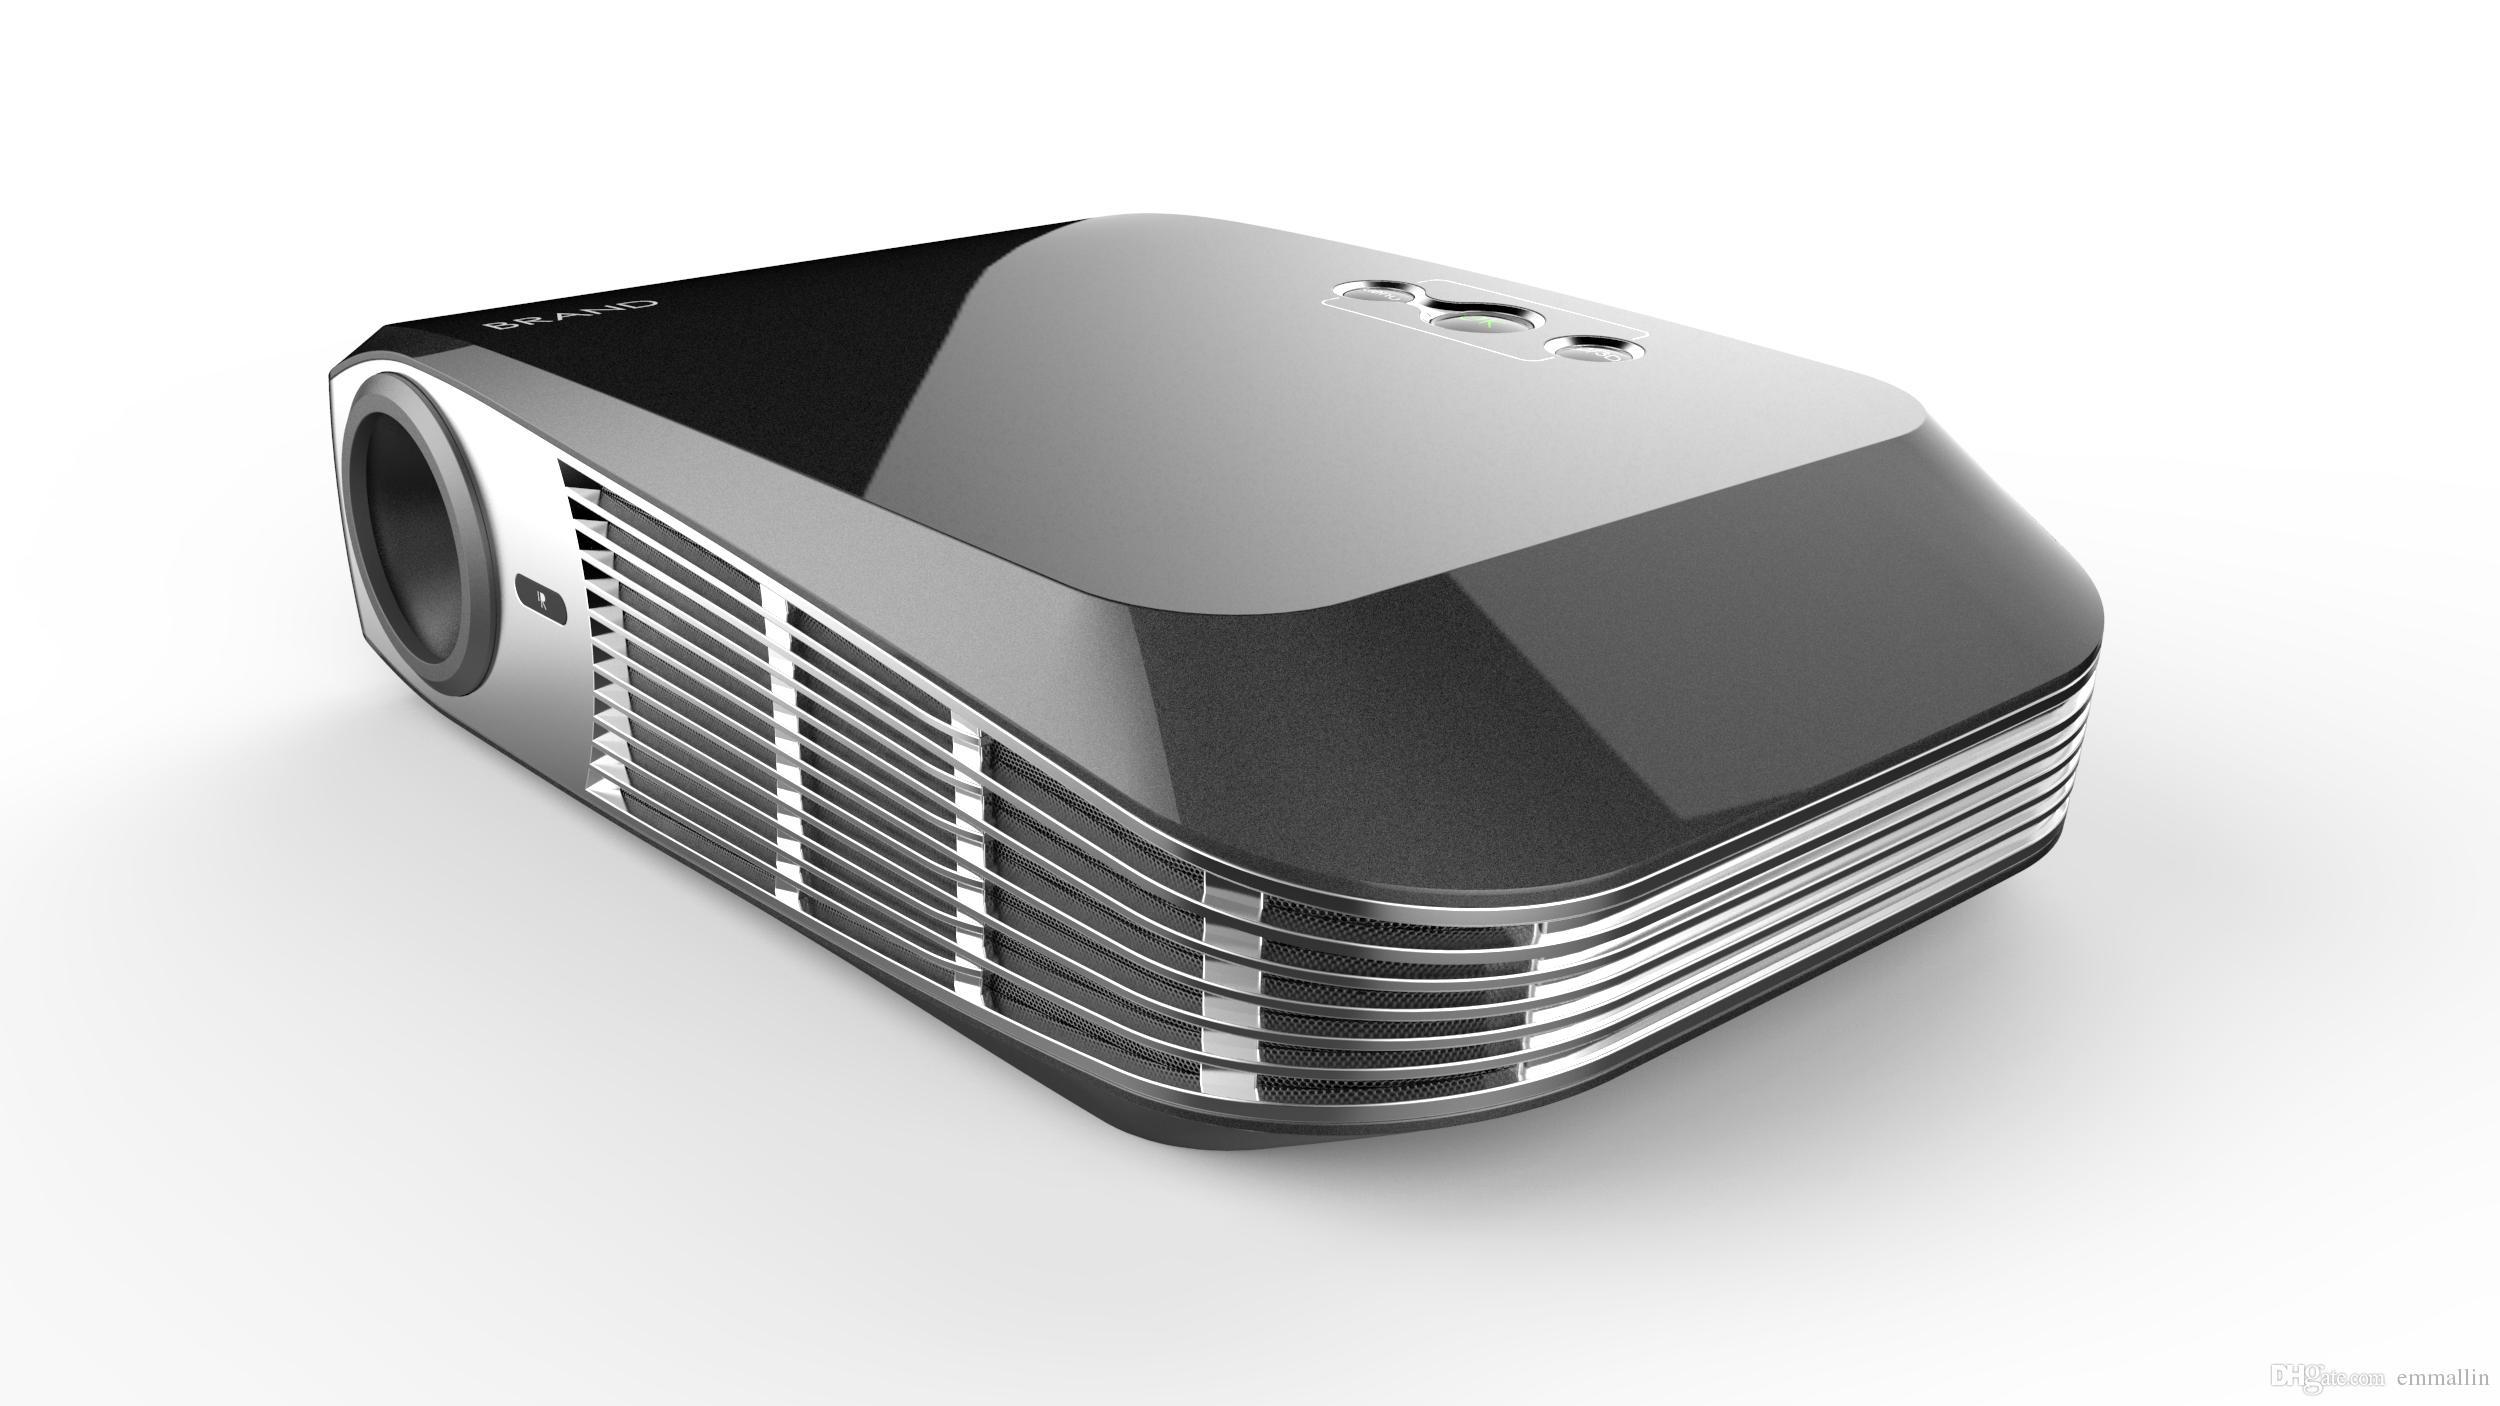 Ovtech mini smart projector android quad core protable dlp for Mini smart projector